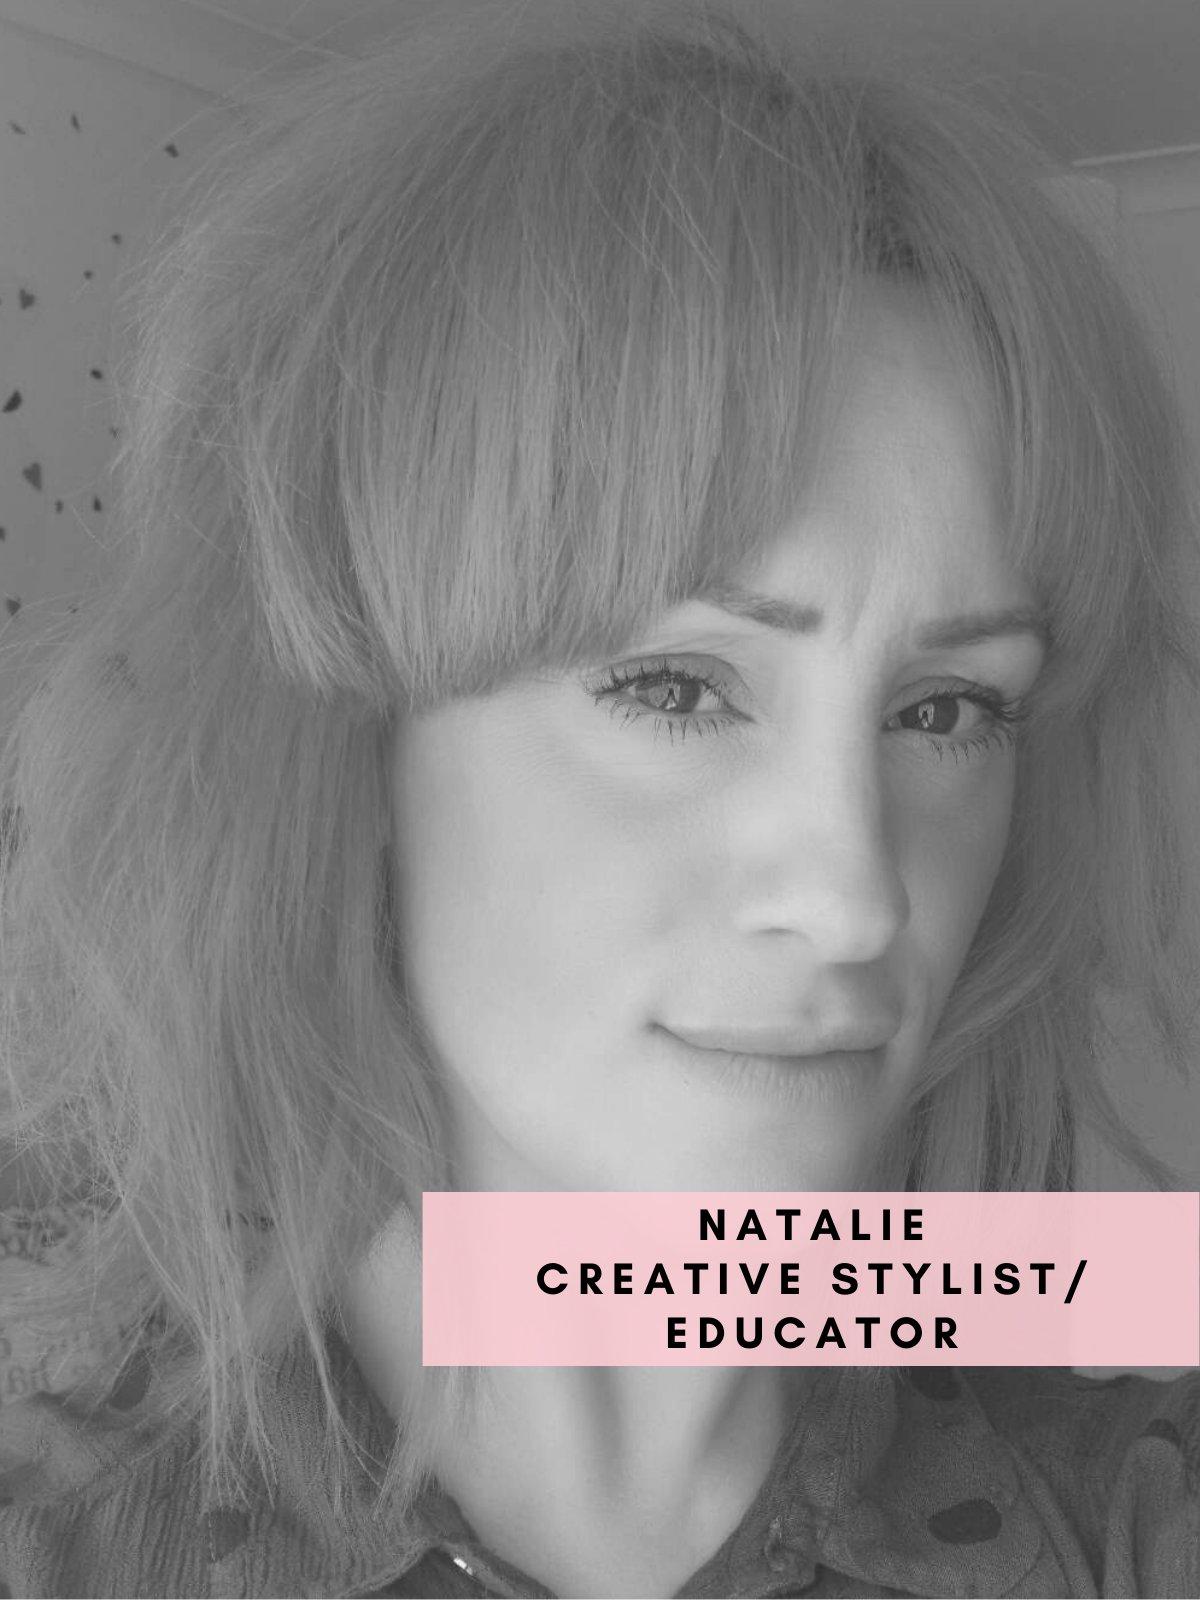 Natalie – Creative Stylist/Educator